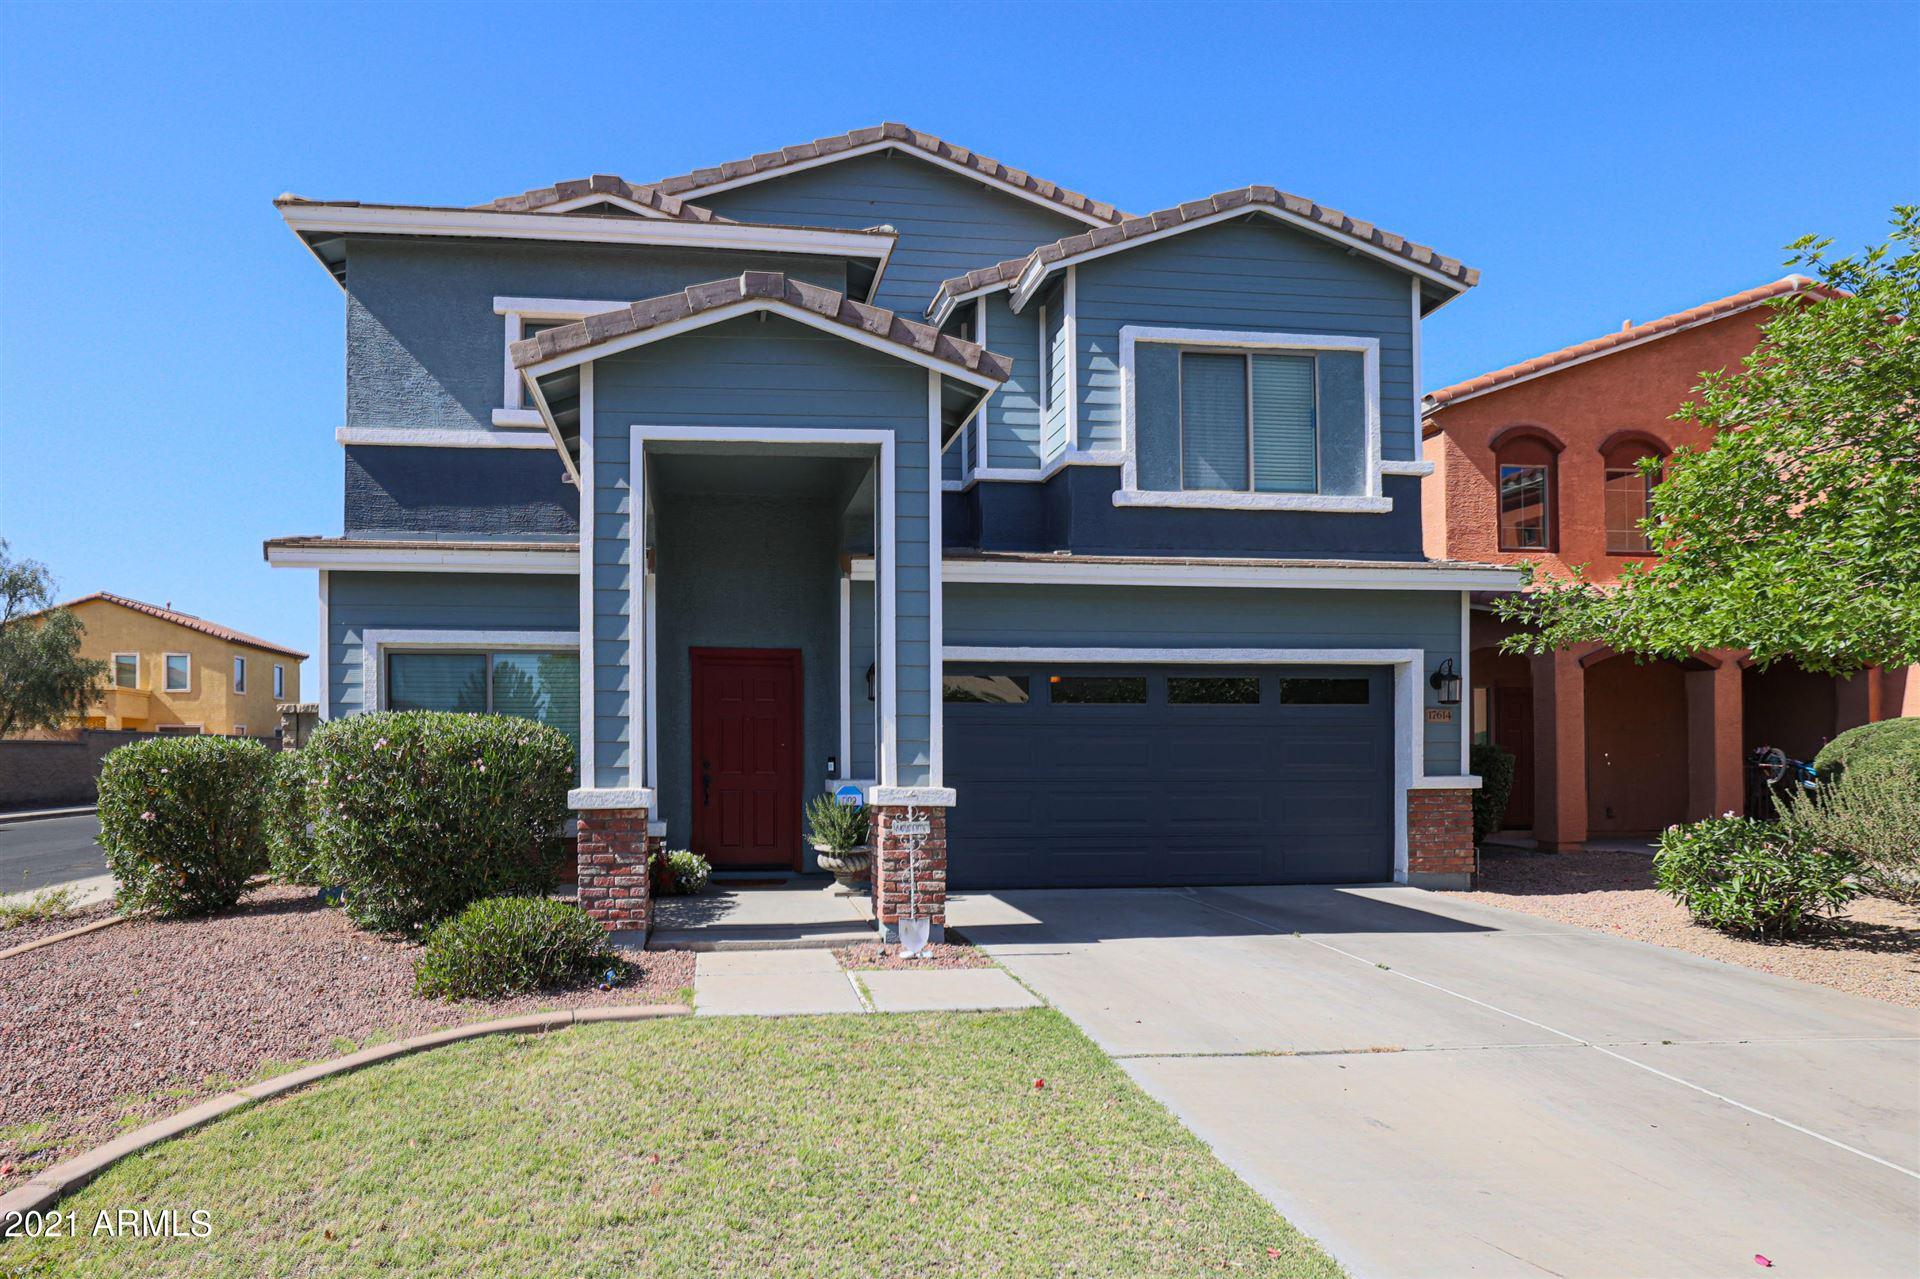 17614 W BRIDGER Street, Surprise, AZ 85388 - MLS#: 6233847